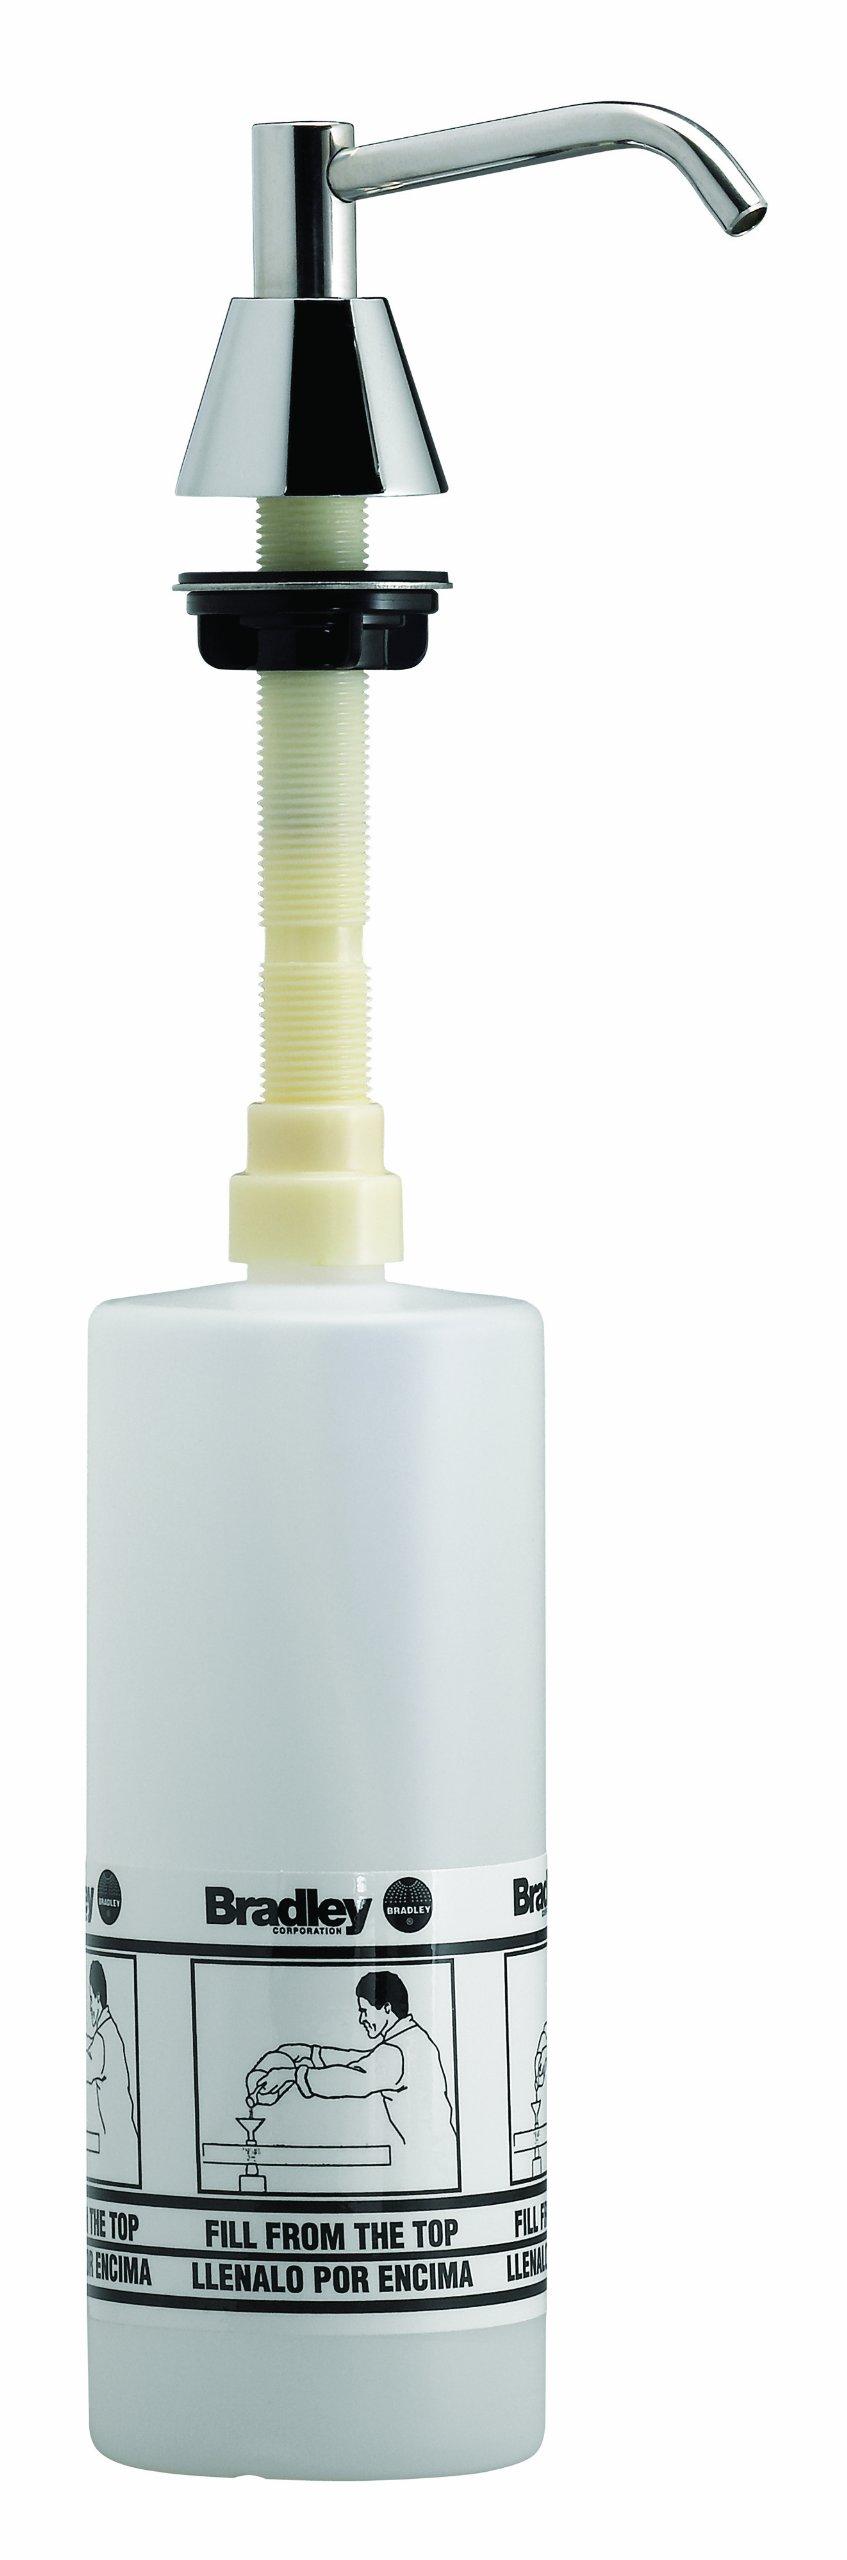 Bradley 6324-680000 Lavatory Mounted Soap Dispenser, 32 oz. Capacity, 4'' Spout, 8-15/16'' Length x 3-1/4'' Width